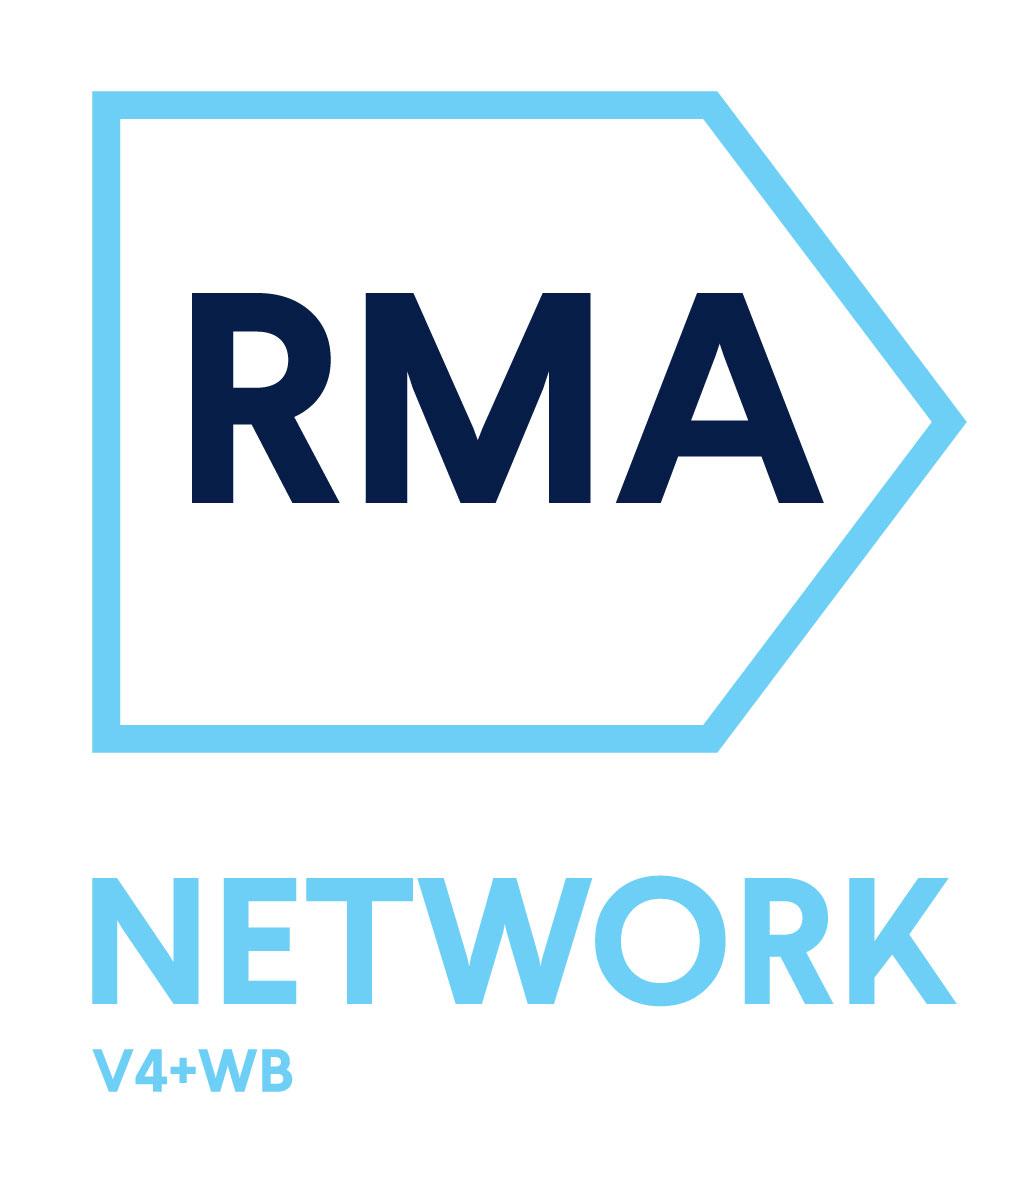 V4+WB RMA Network